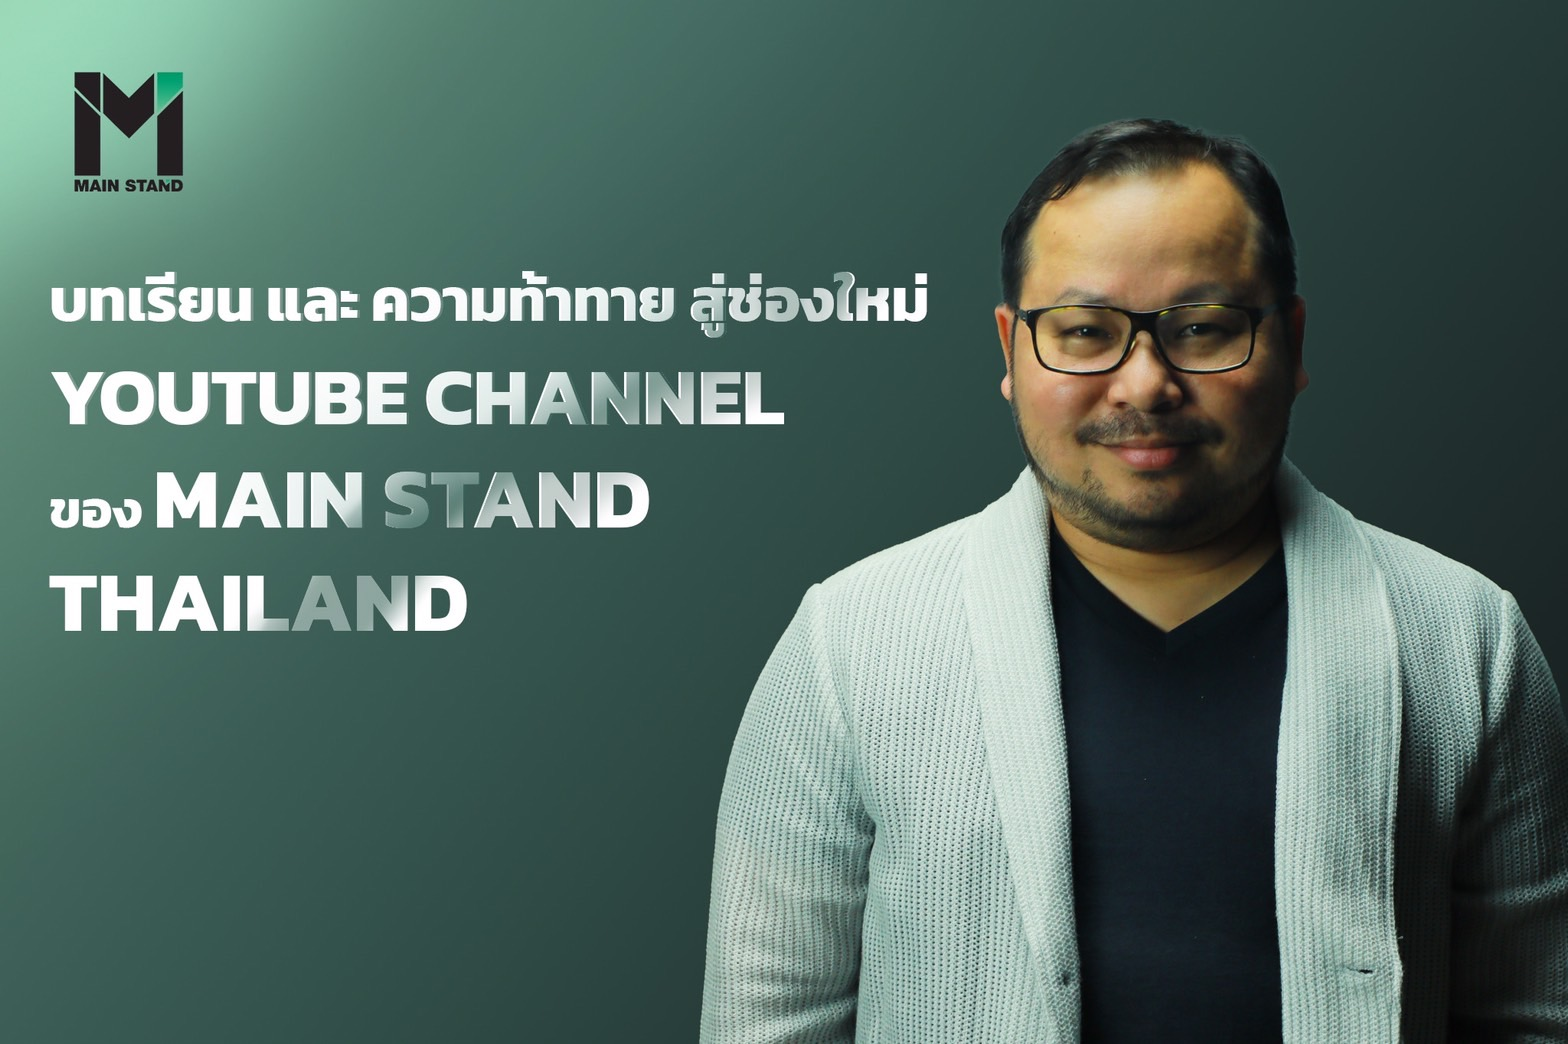 Digital Busines MAIN STAND THAILAND บริษัท เมนสแตนด์ ครีเอเตอร์ (ประเทศไทย) จำกัด